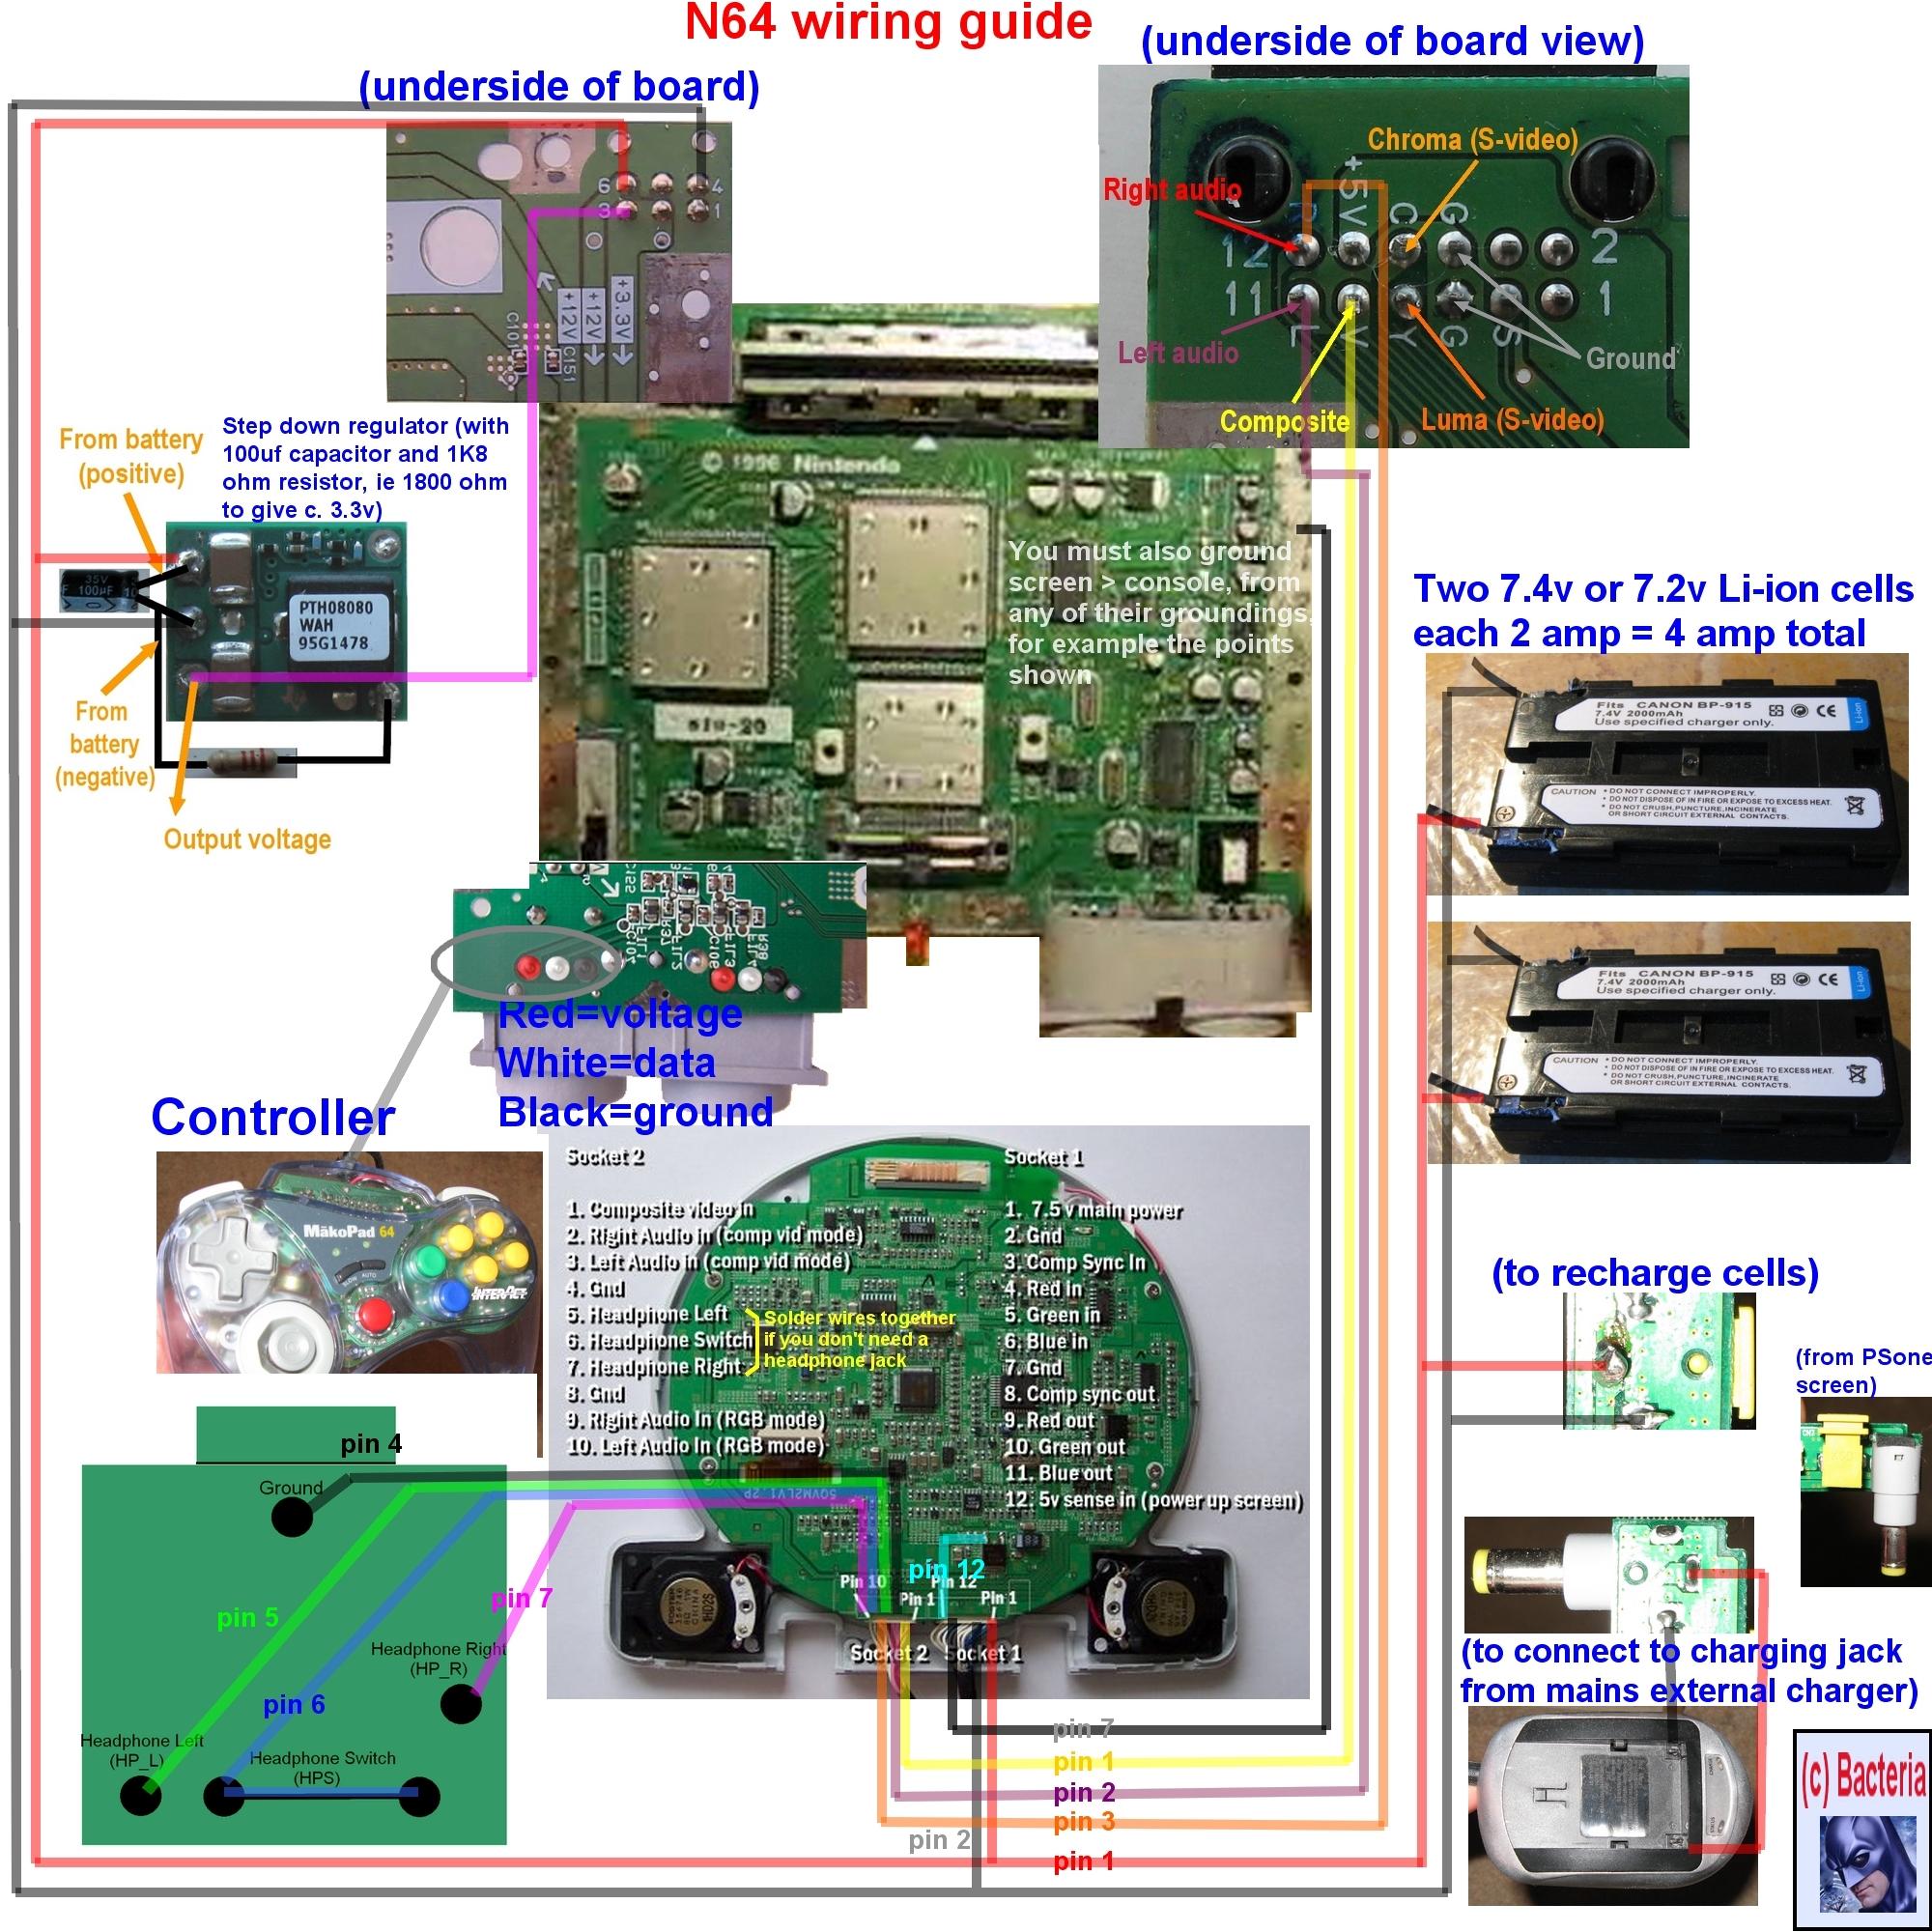 nintendo n64wiring guide! if